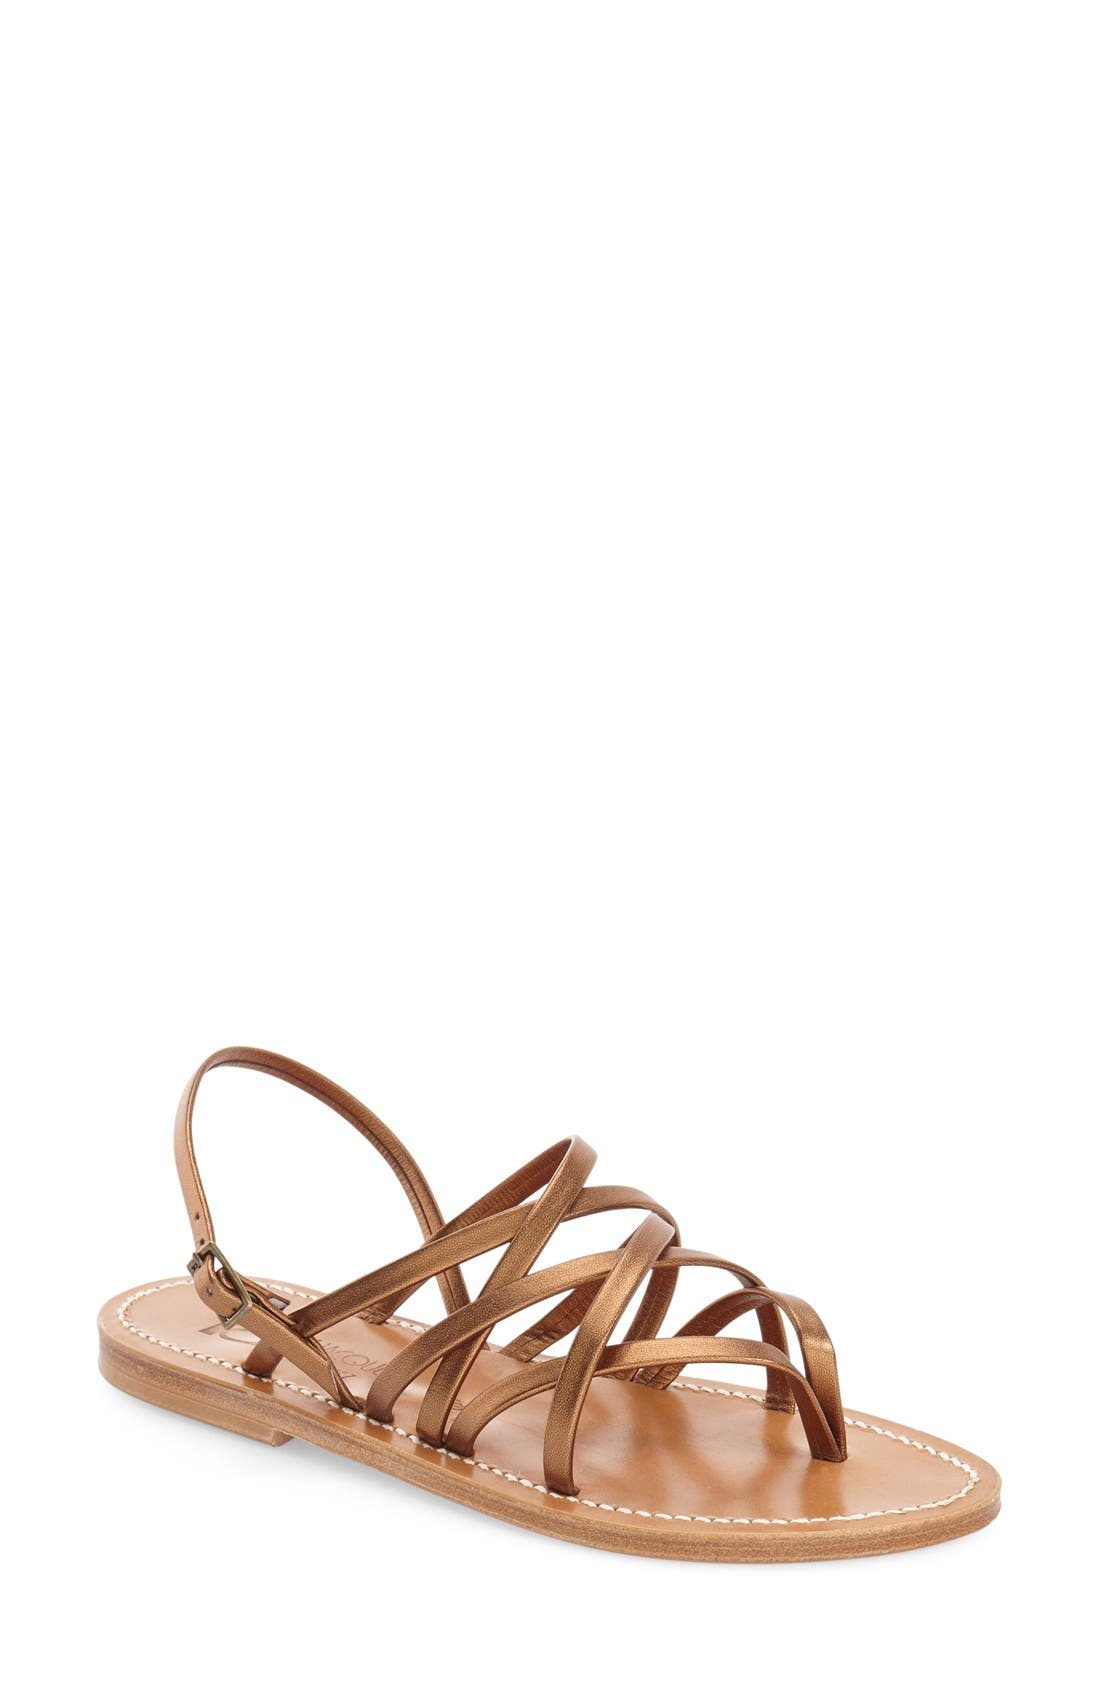 Main Image - K.Jacques St. Tropez Strappy Flat Sandal (Women)